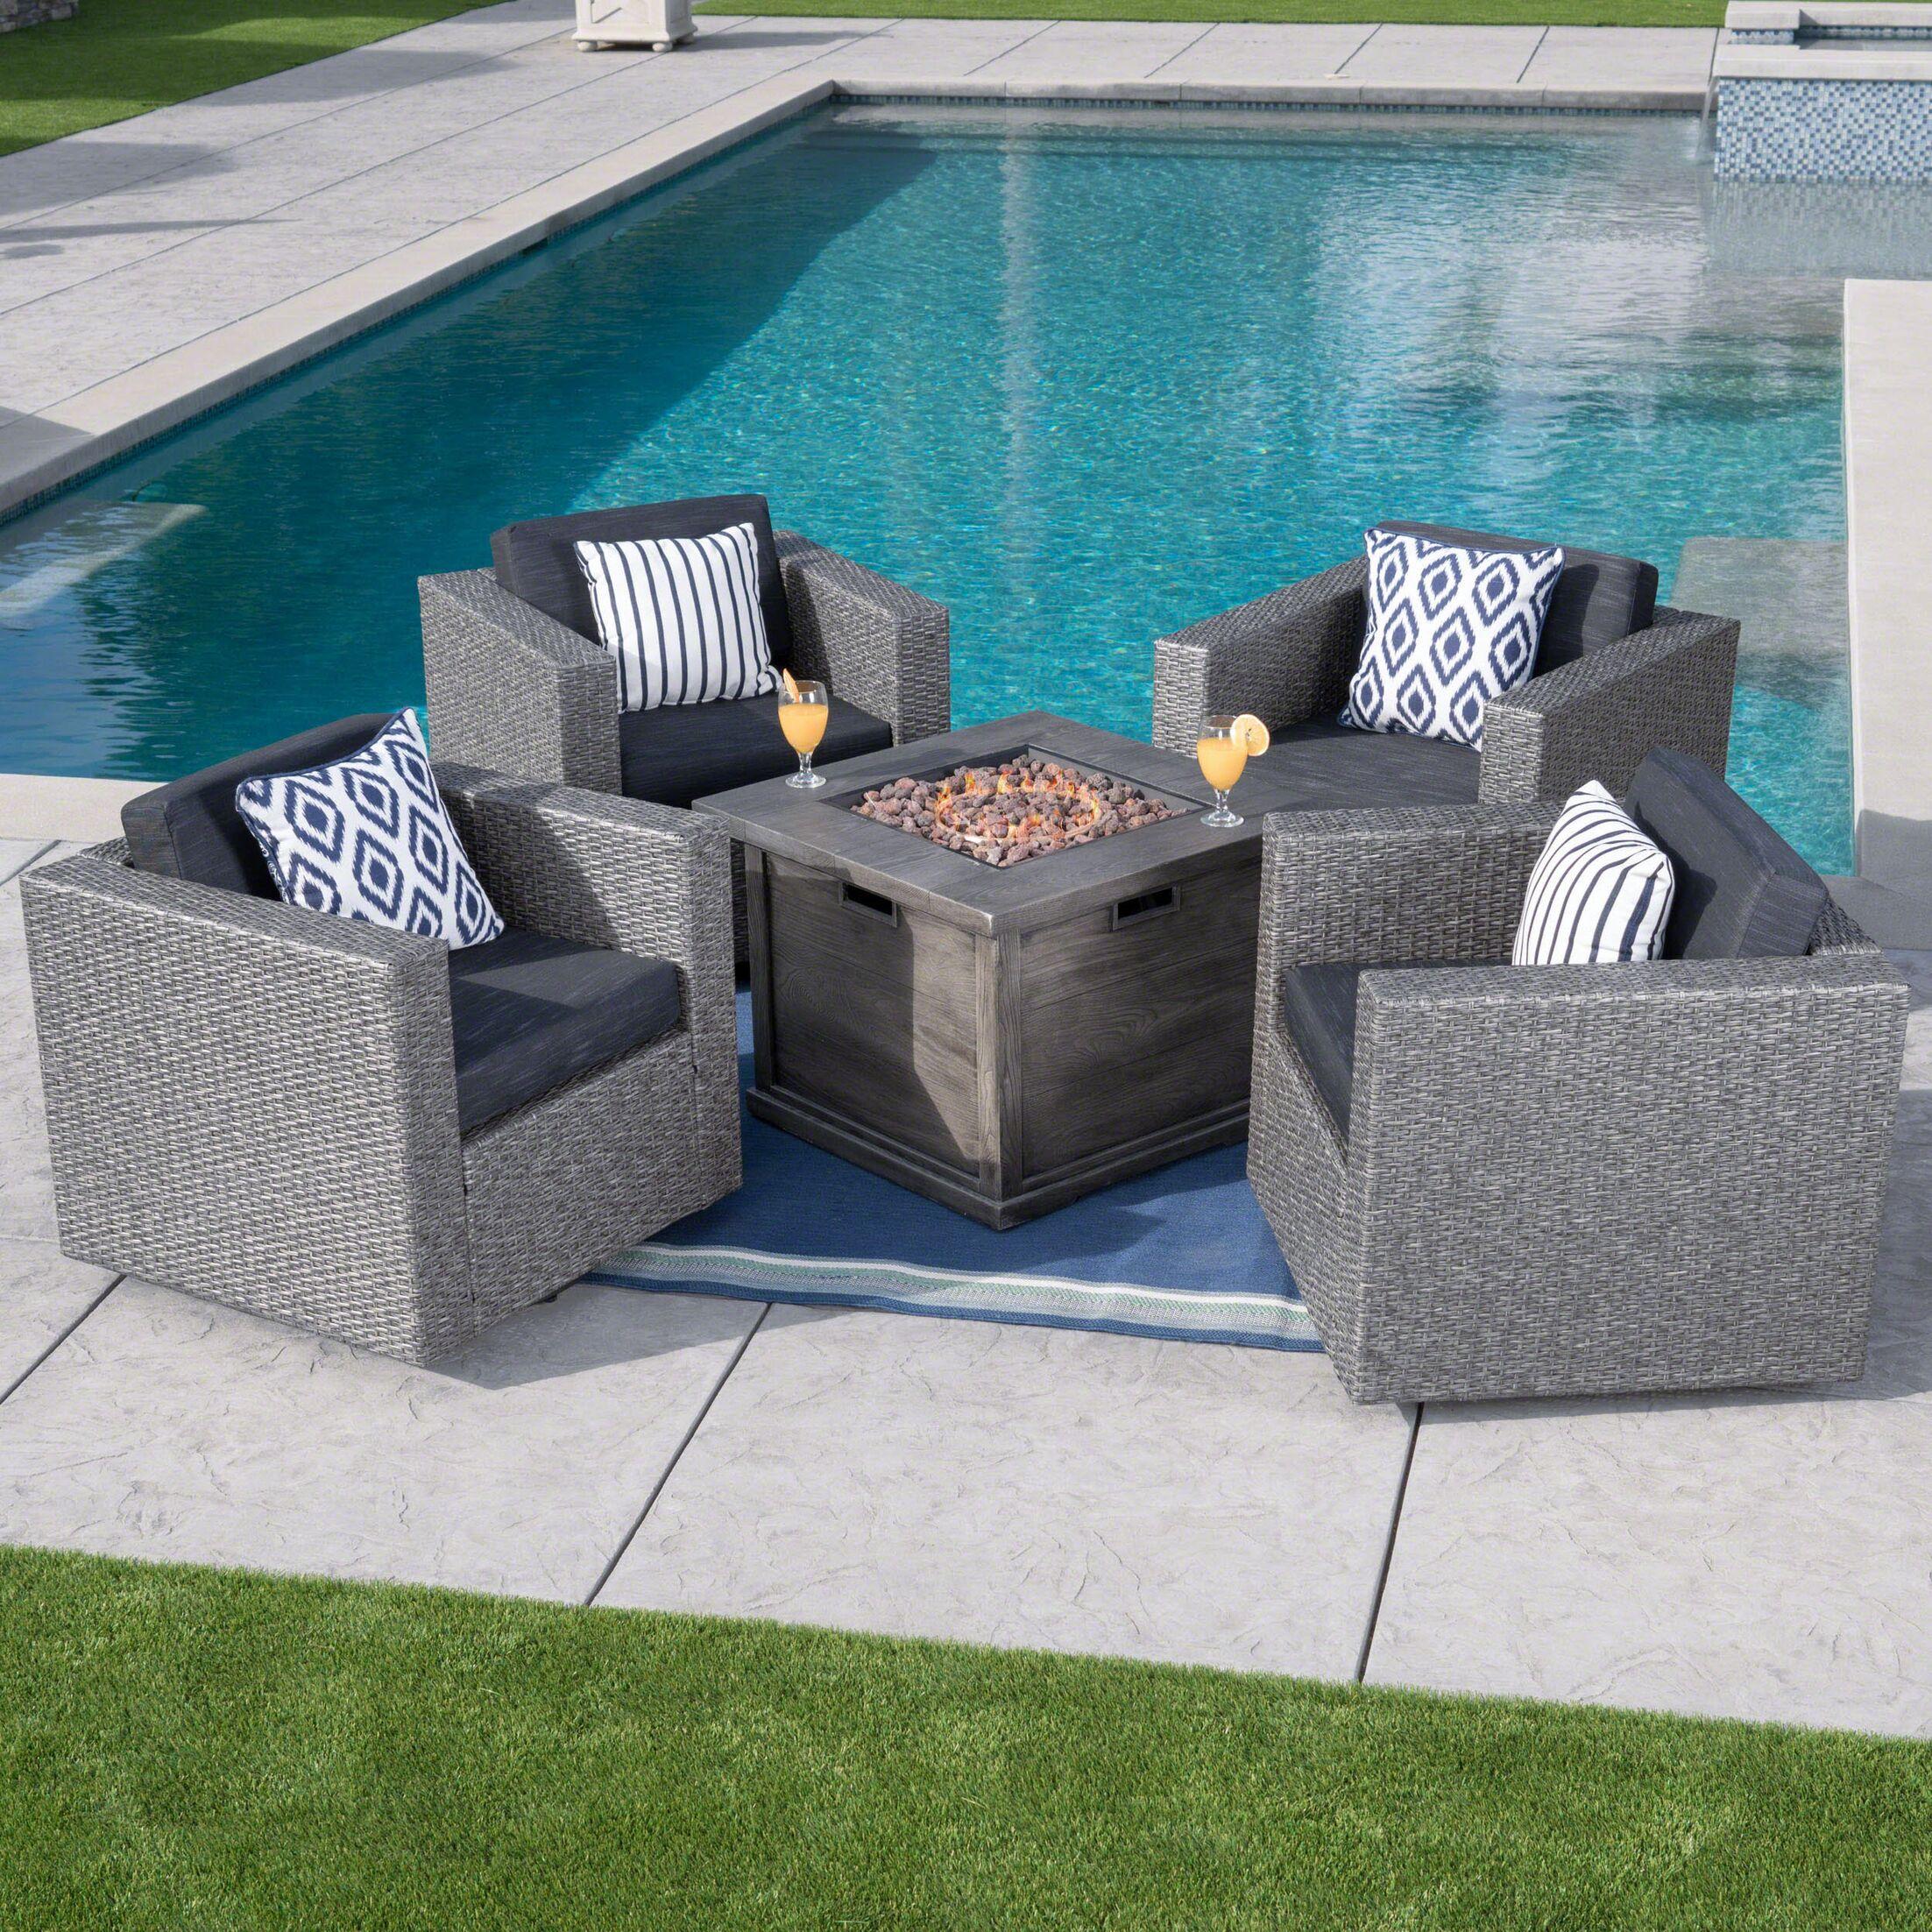 Cirillo 5 Piece Conversation Set with Cushions Cushion Color: Mixed Black